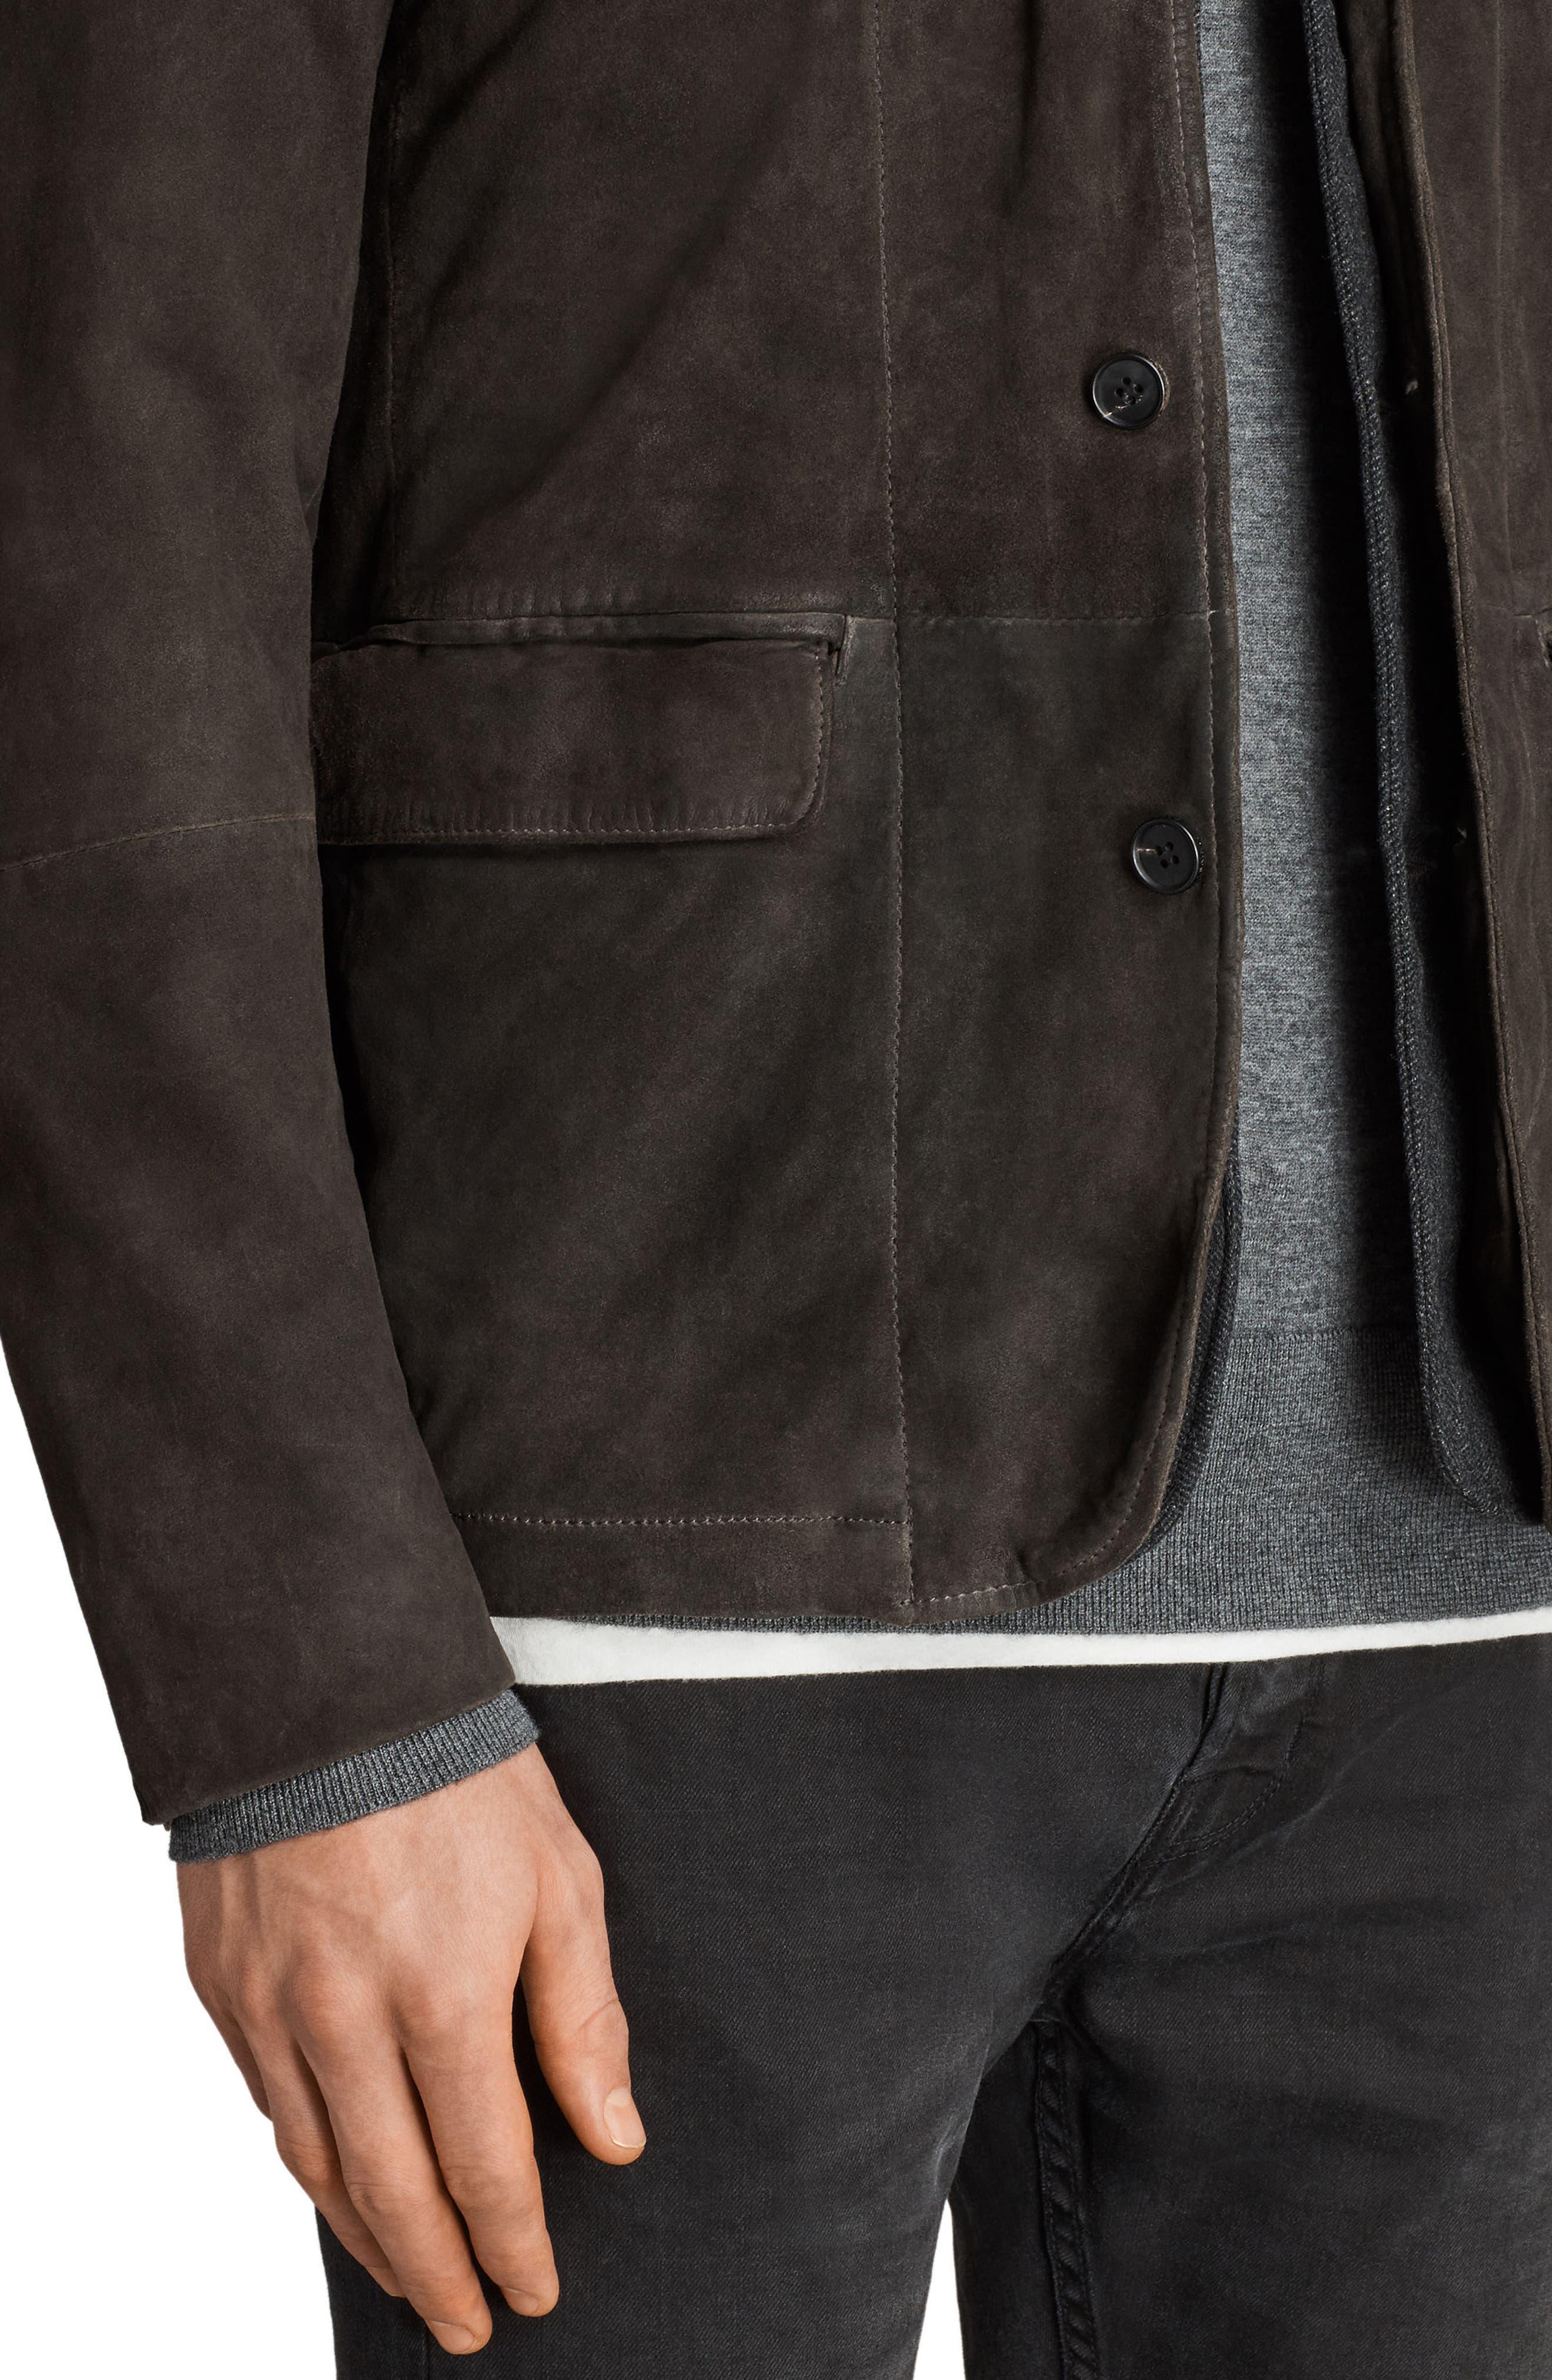 Survey Leather Blazer,                             Alternate thumbnail 6, color,                             ANTHRACITE GREY